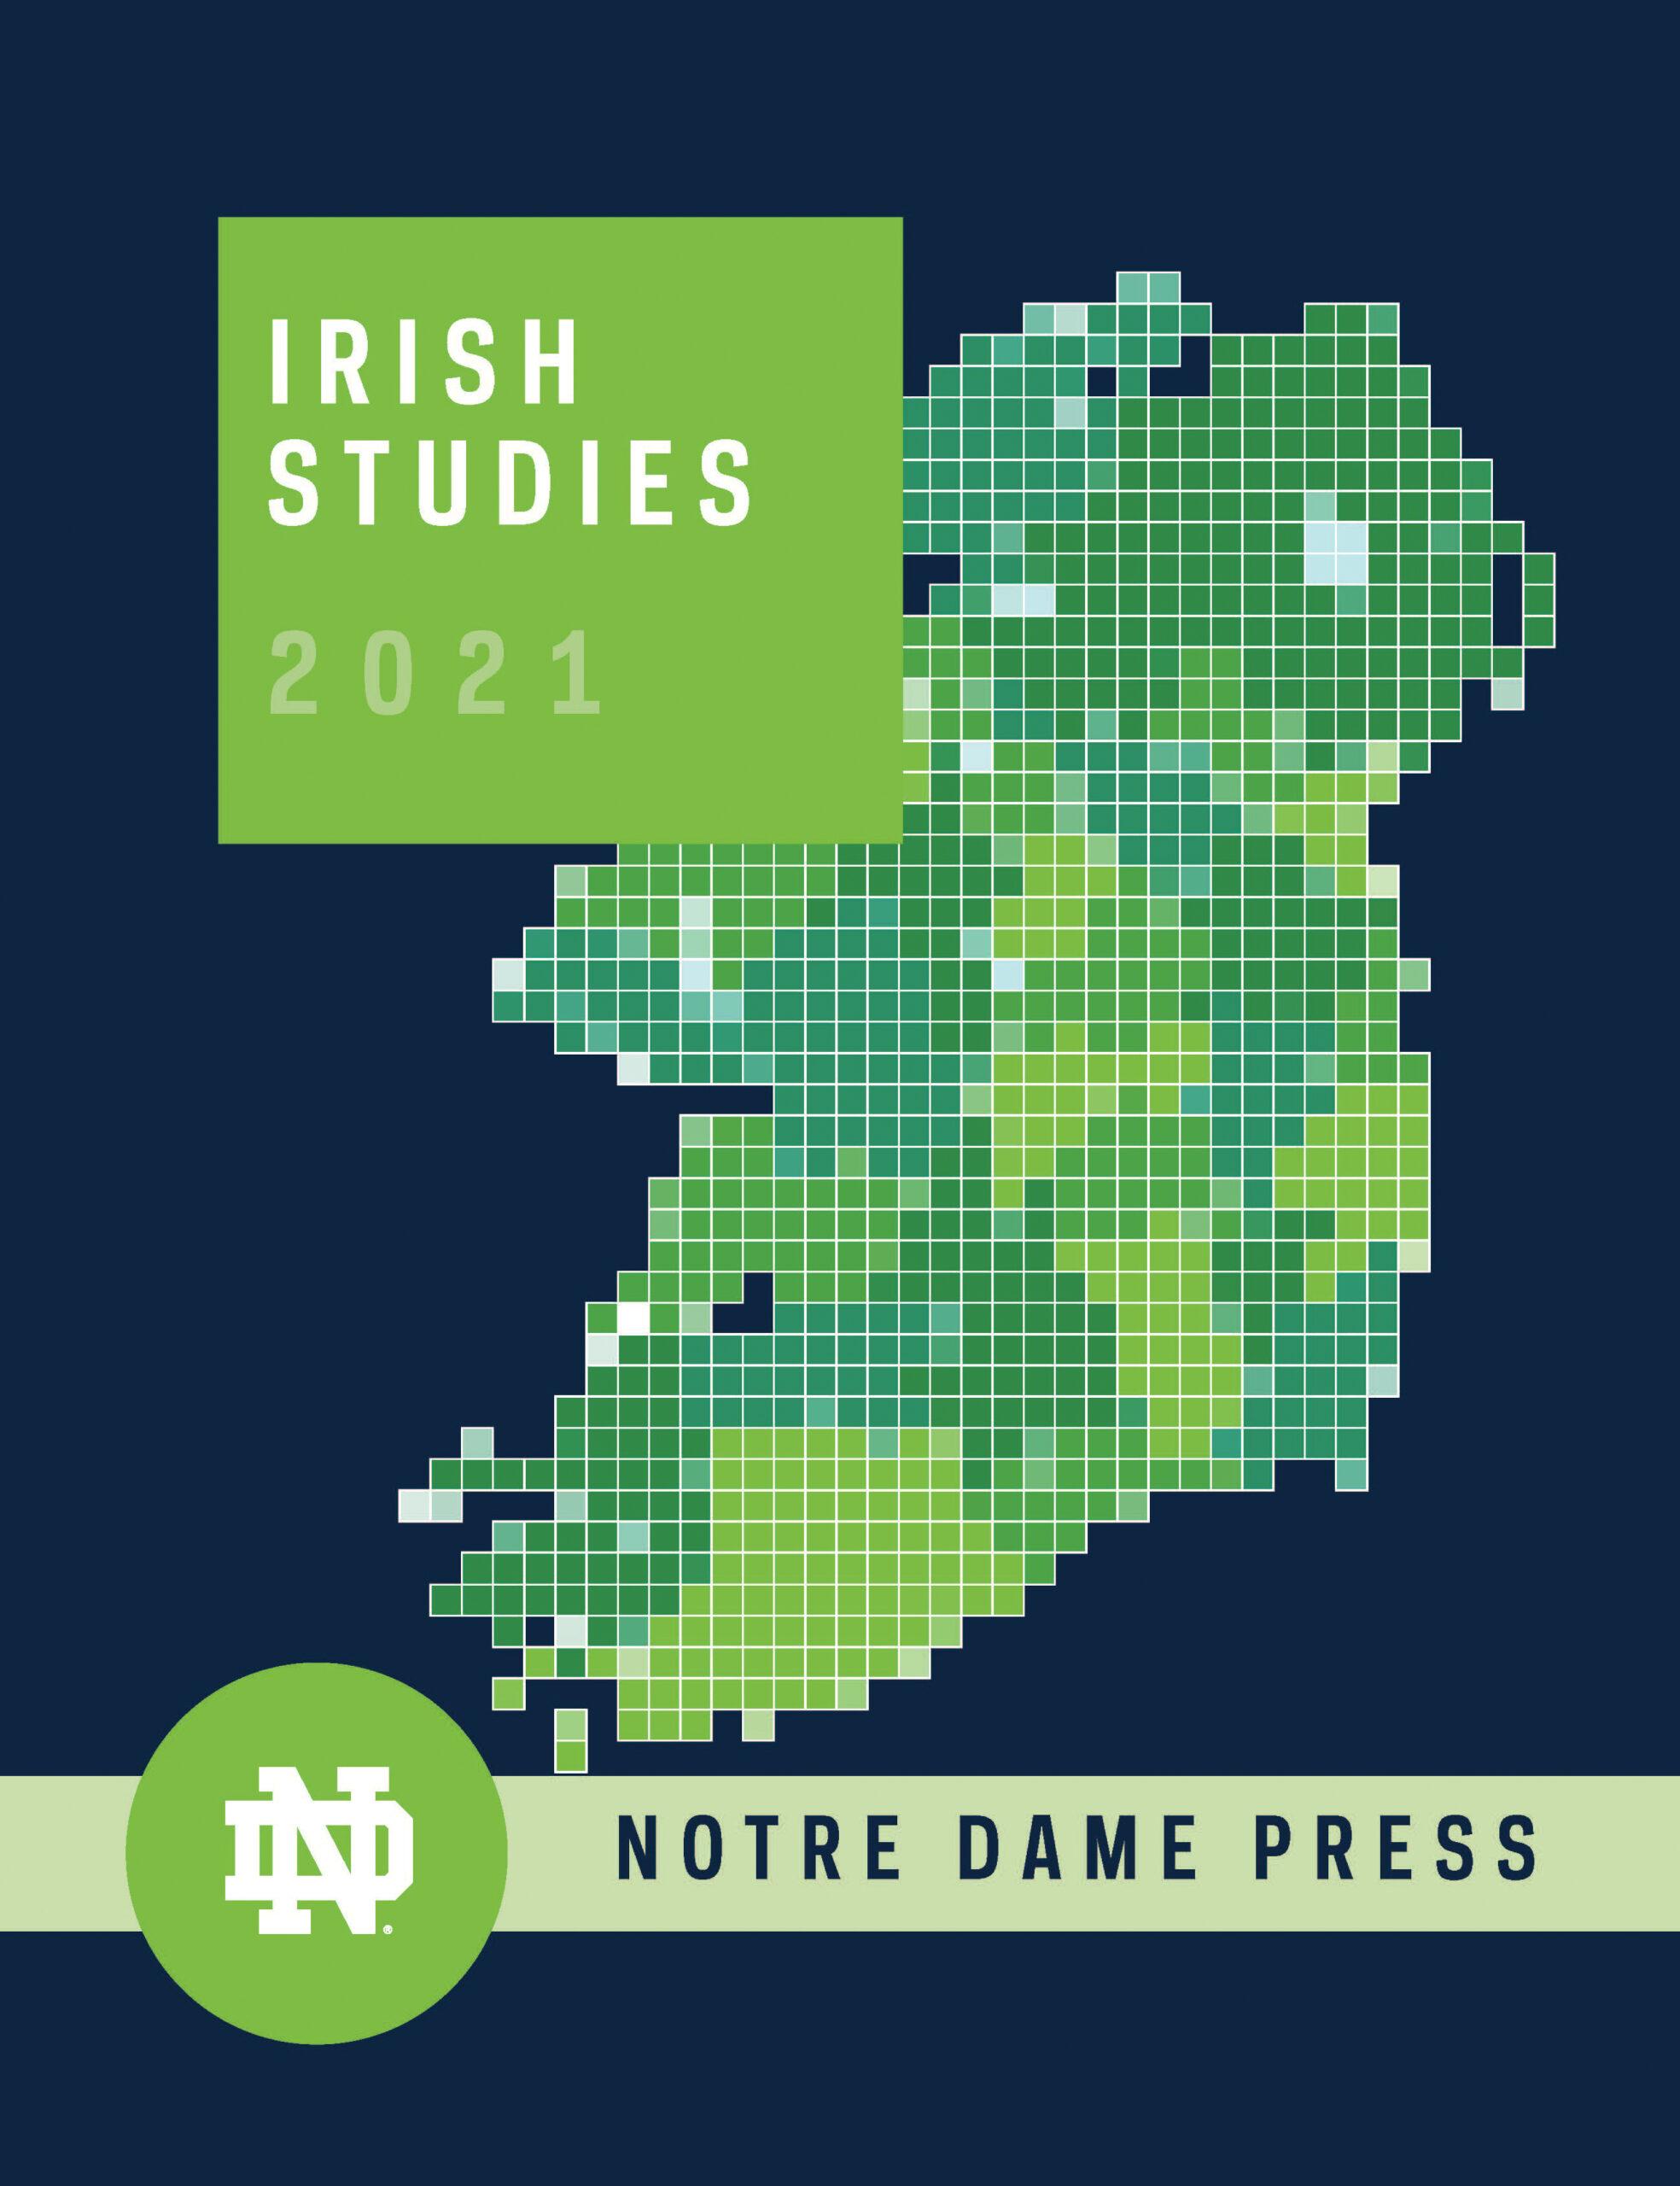 Irish Studies 2021